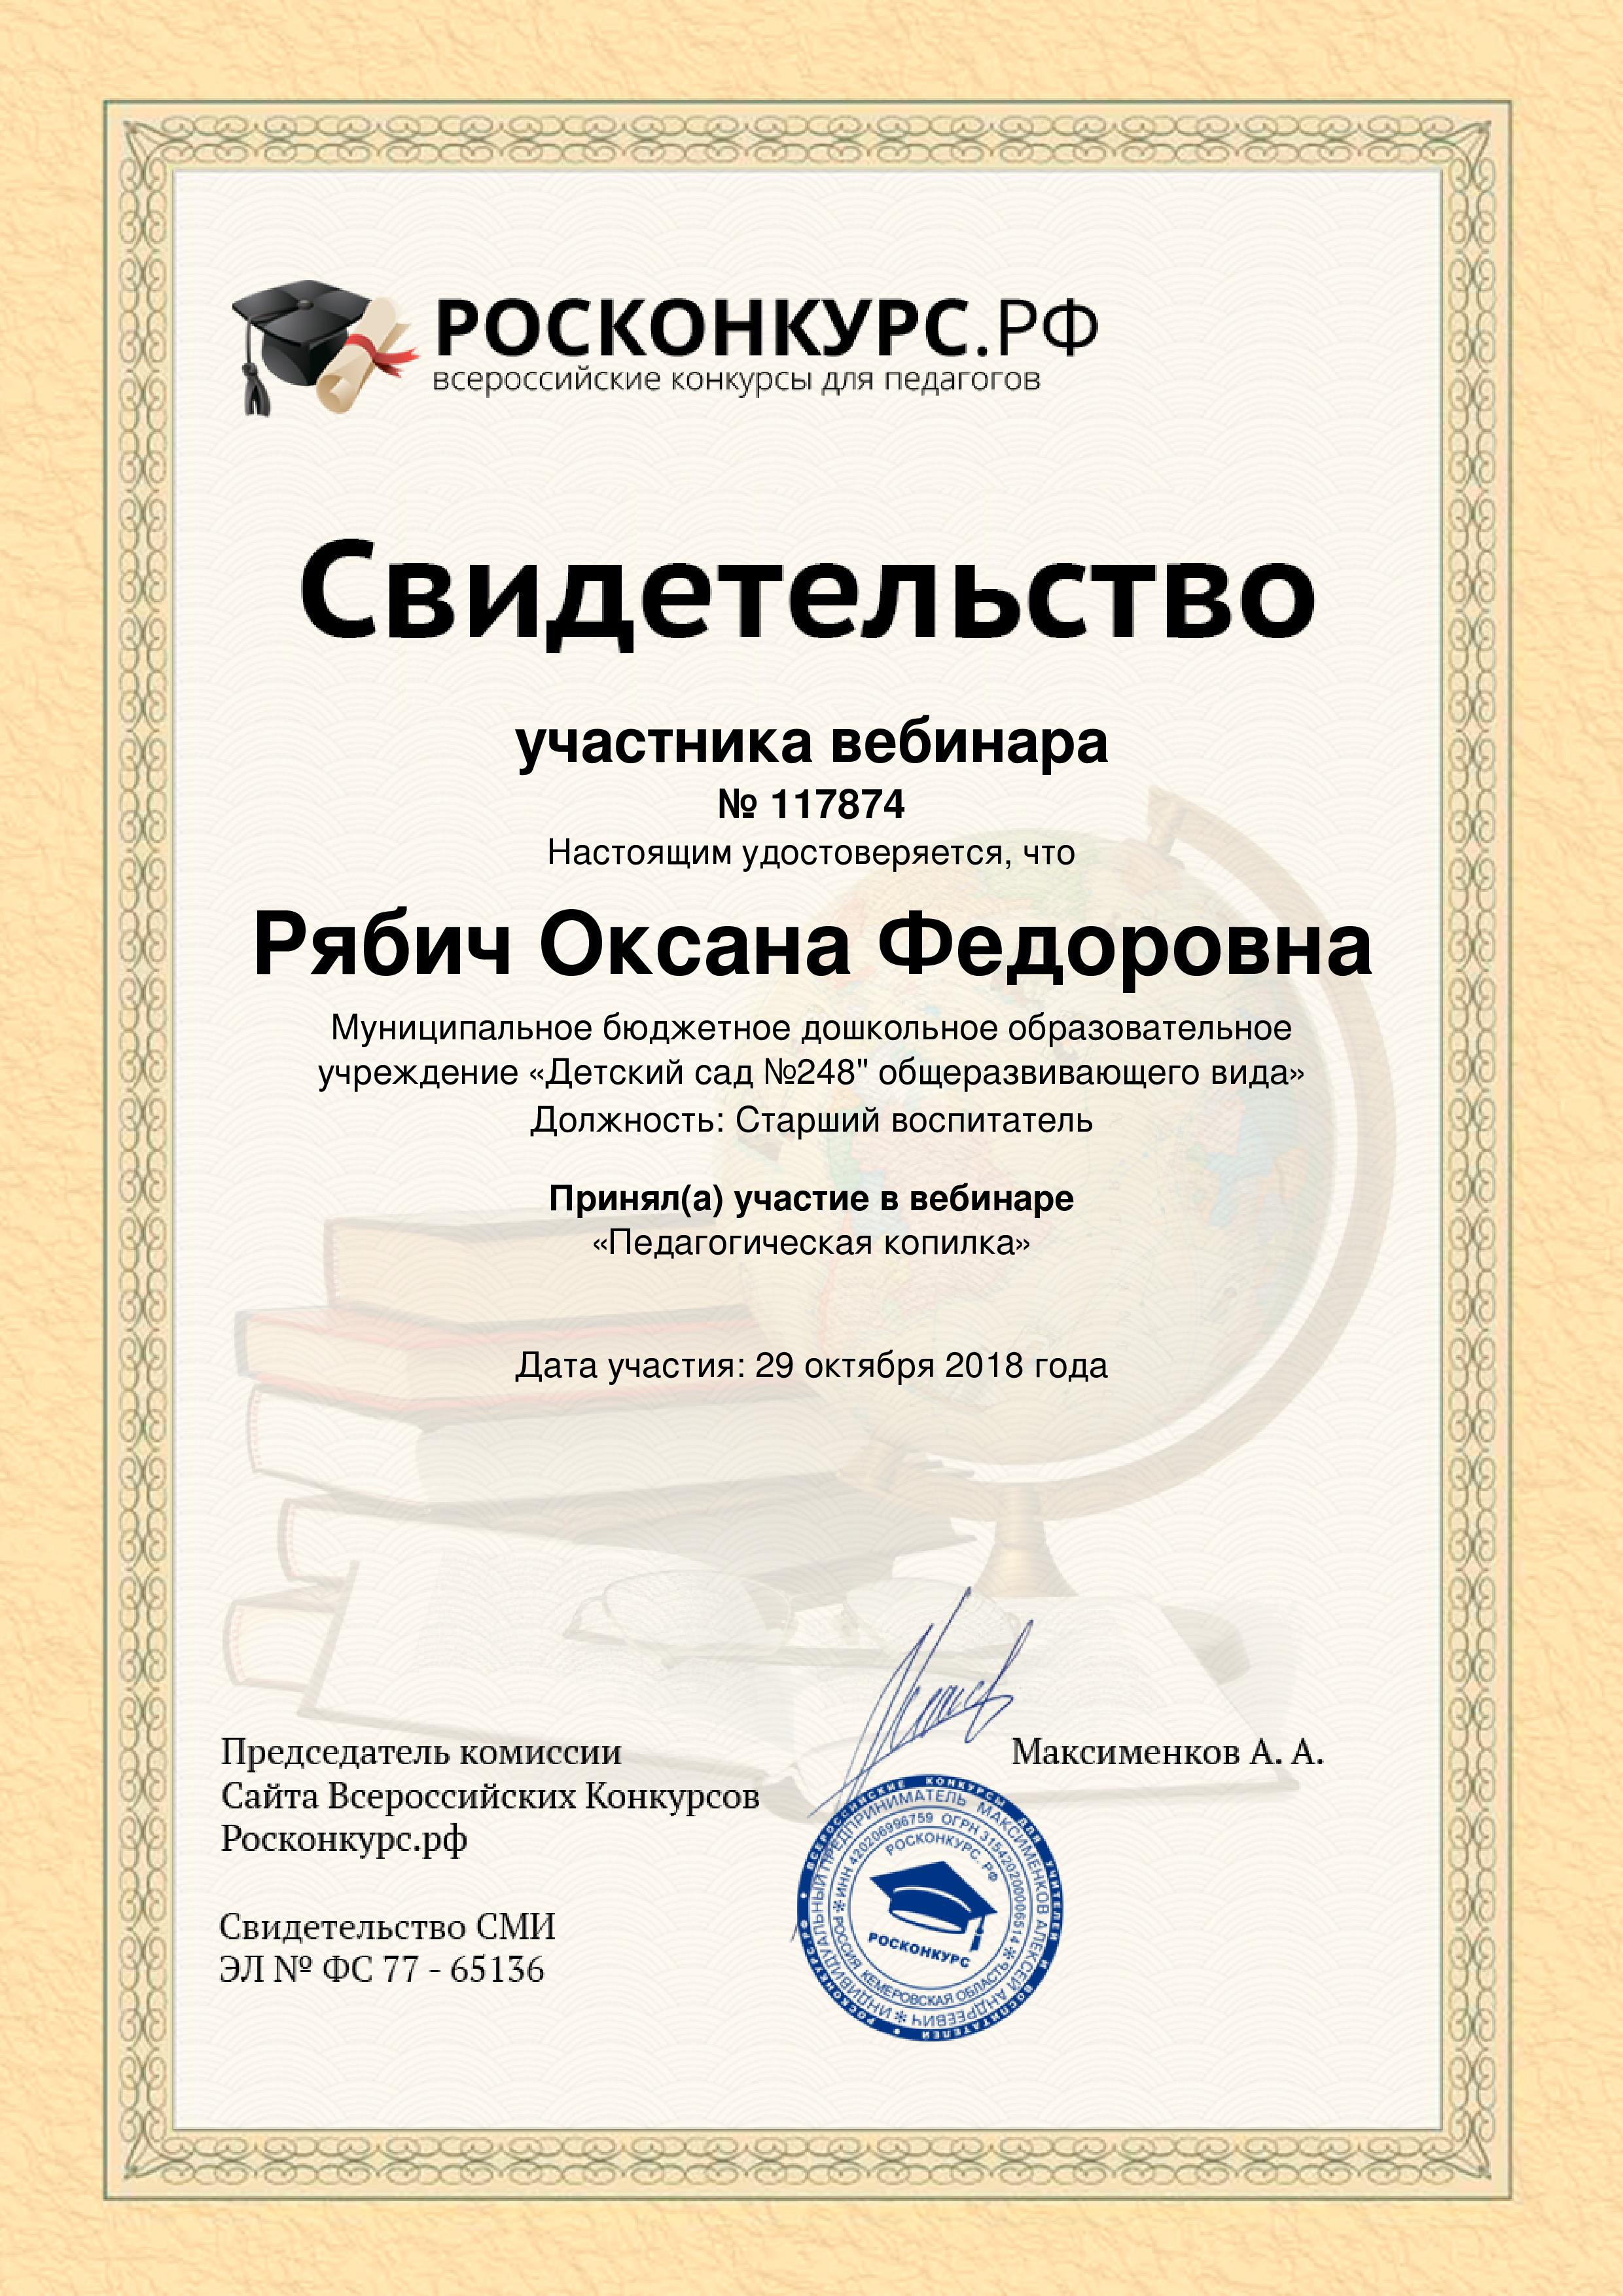 Ryabich-Oksana-Fedorovna (pdf.io)